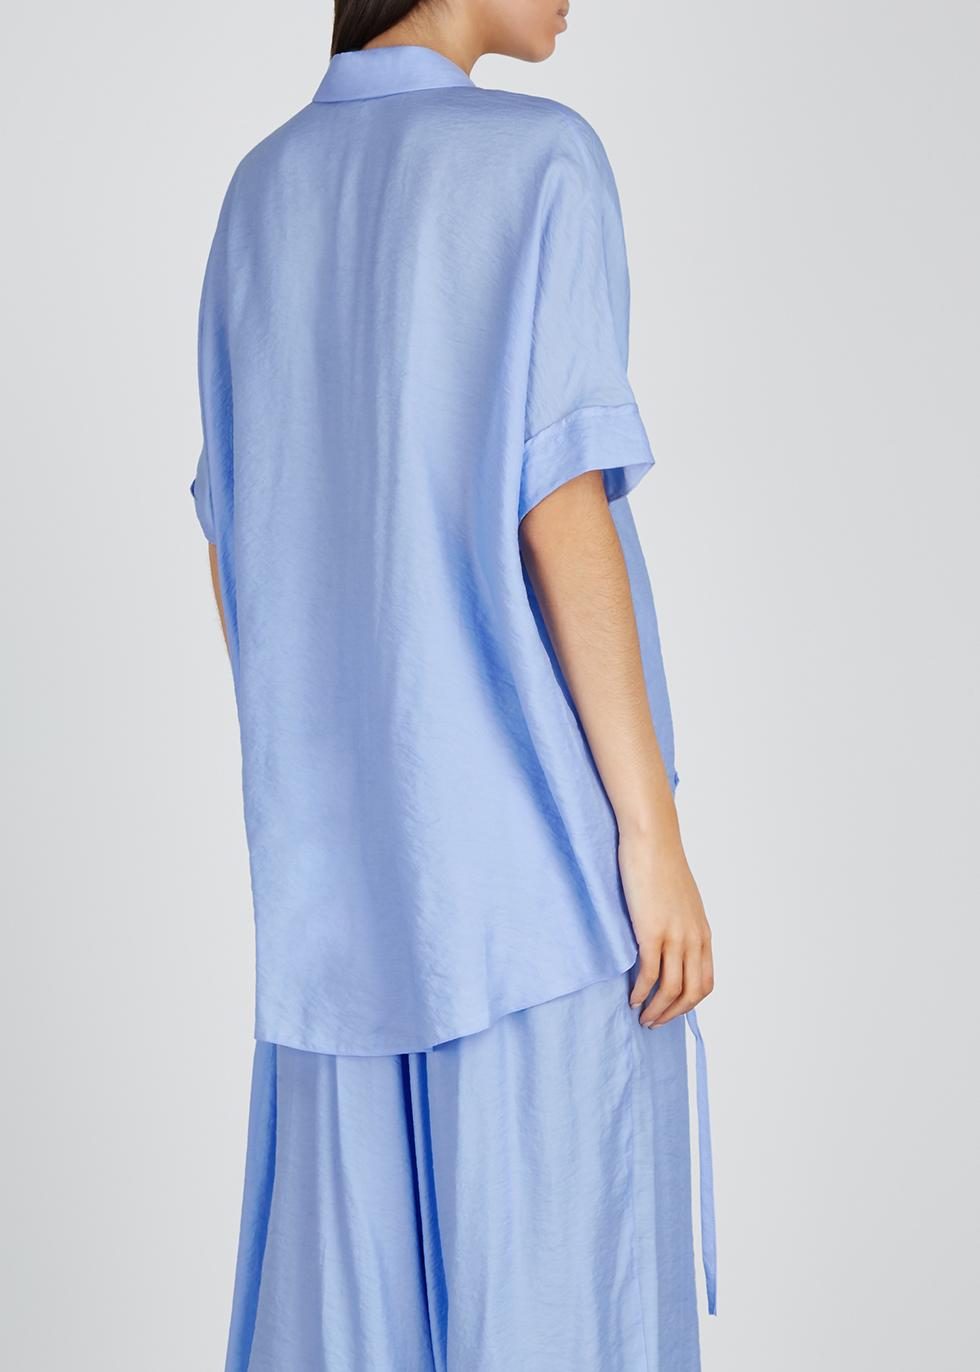 Light blue drawstring shirt - Crea Concept